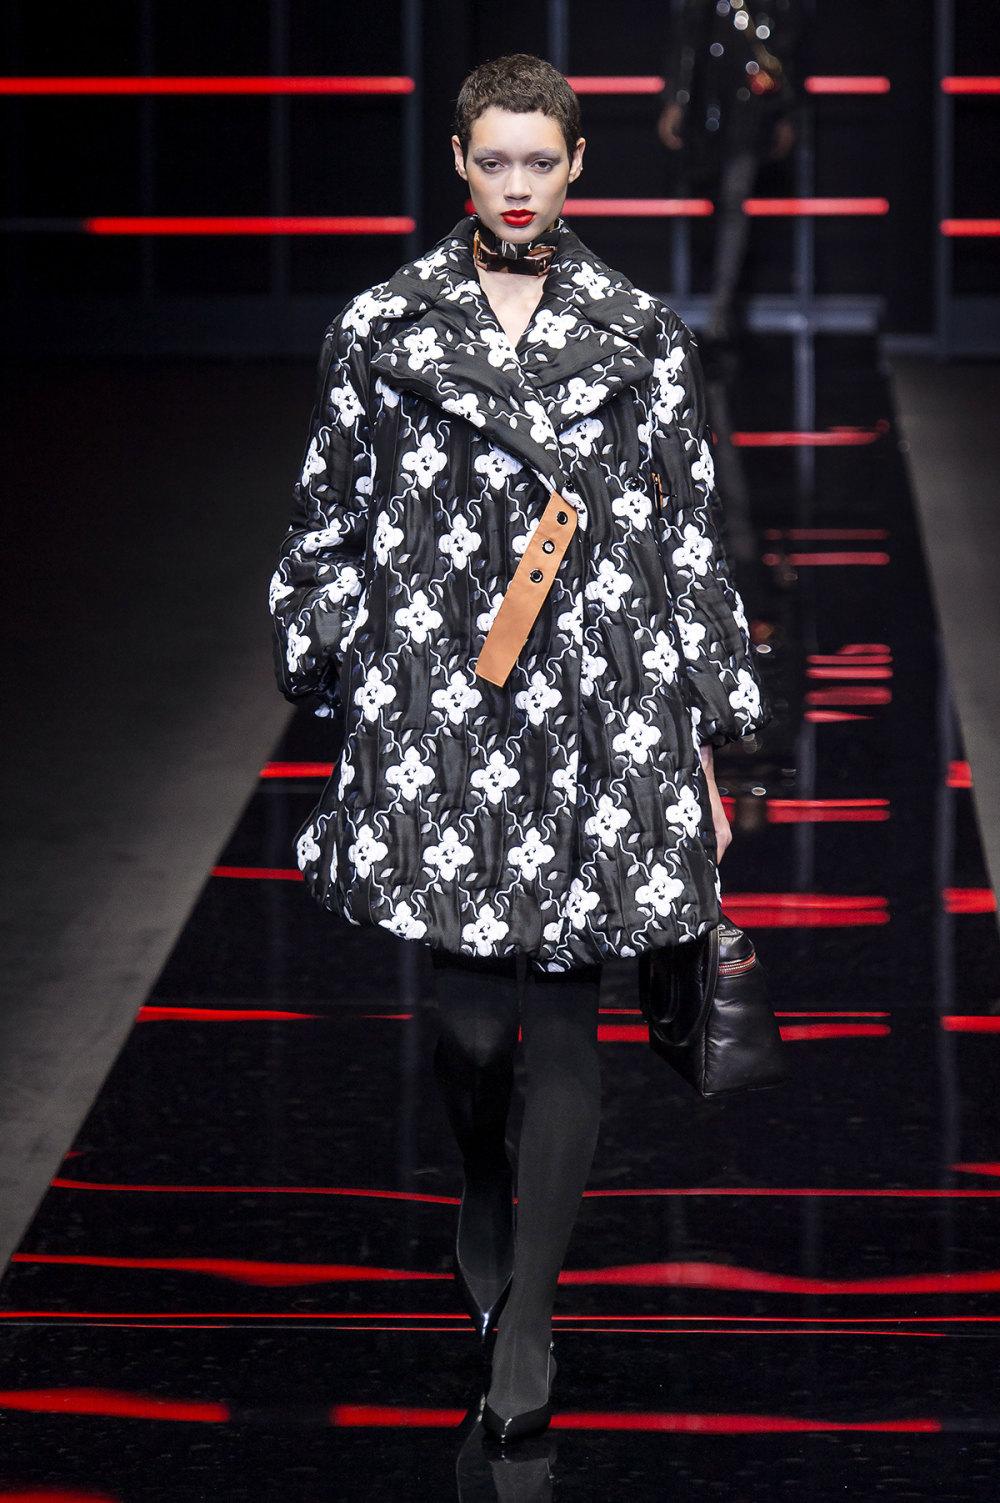 Emporio Armani时装系列畅的裤子带有柔滑裙子的鸡尾酒礼服-47.jpg